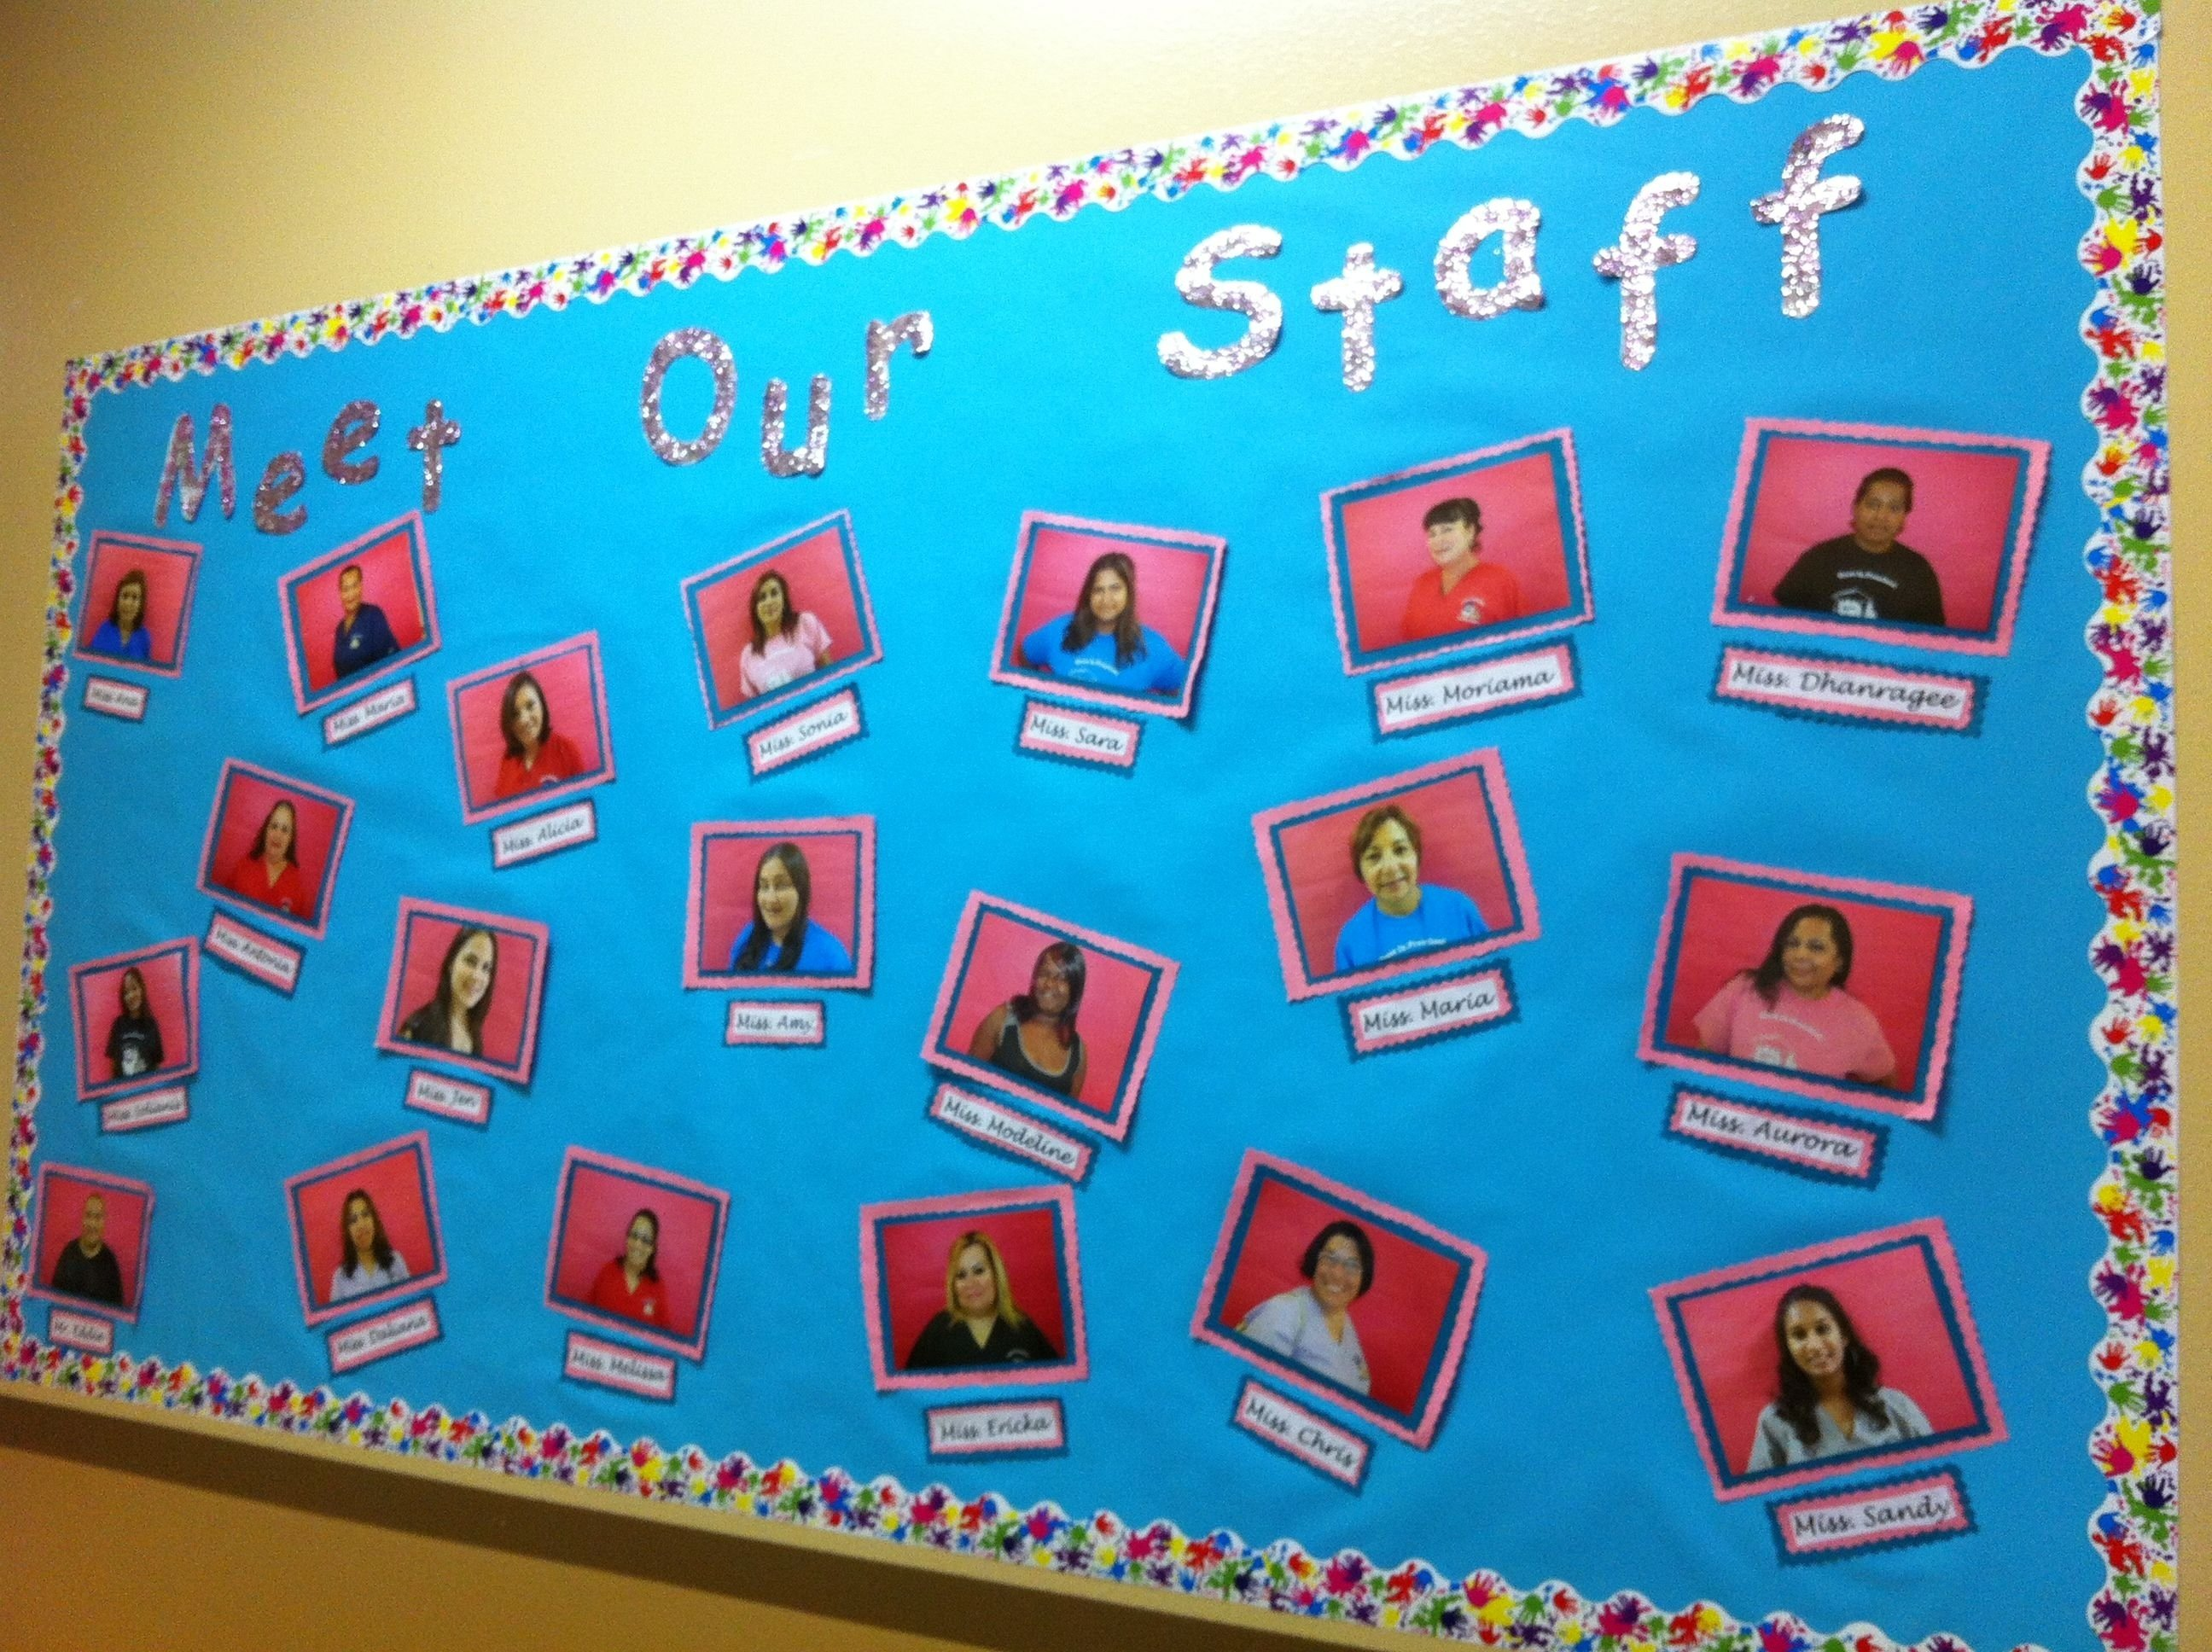 10 Stylish Bulletin Board Ideas For Work meet our staff bulletin board education pinterest staff 1 2020